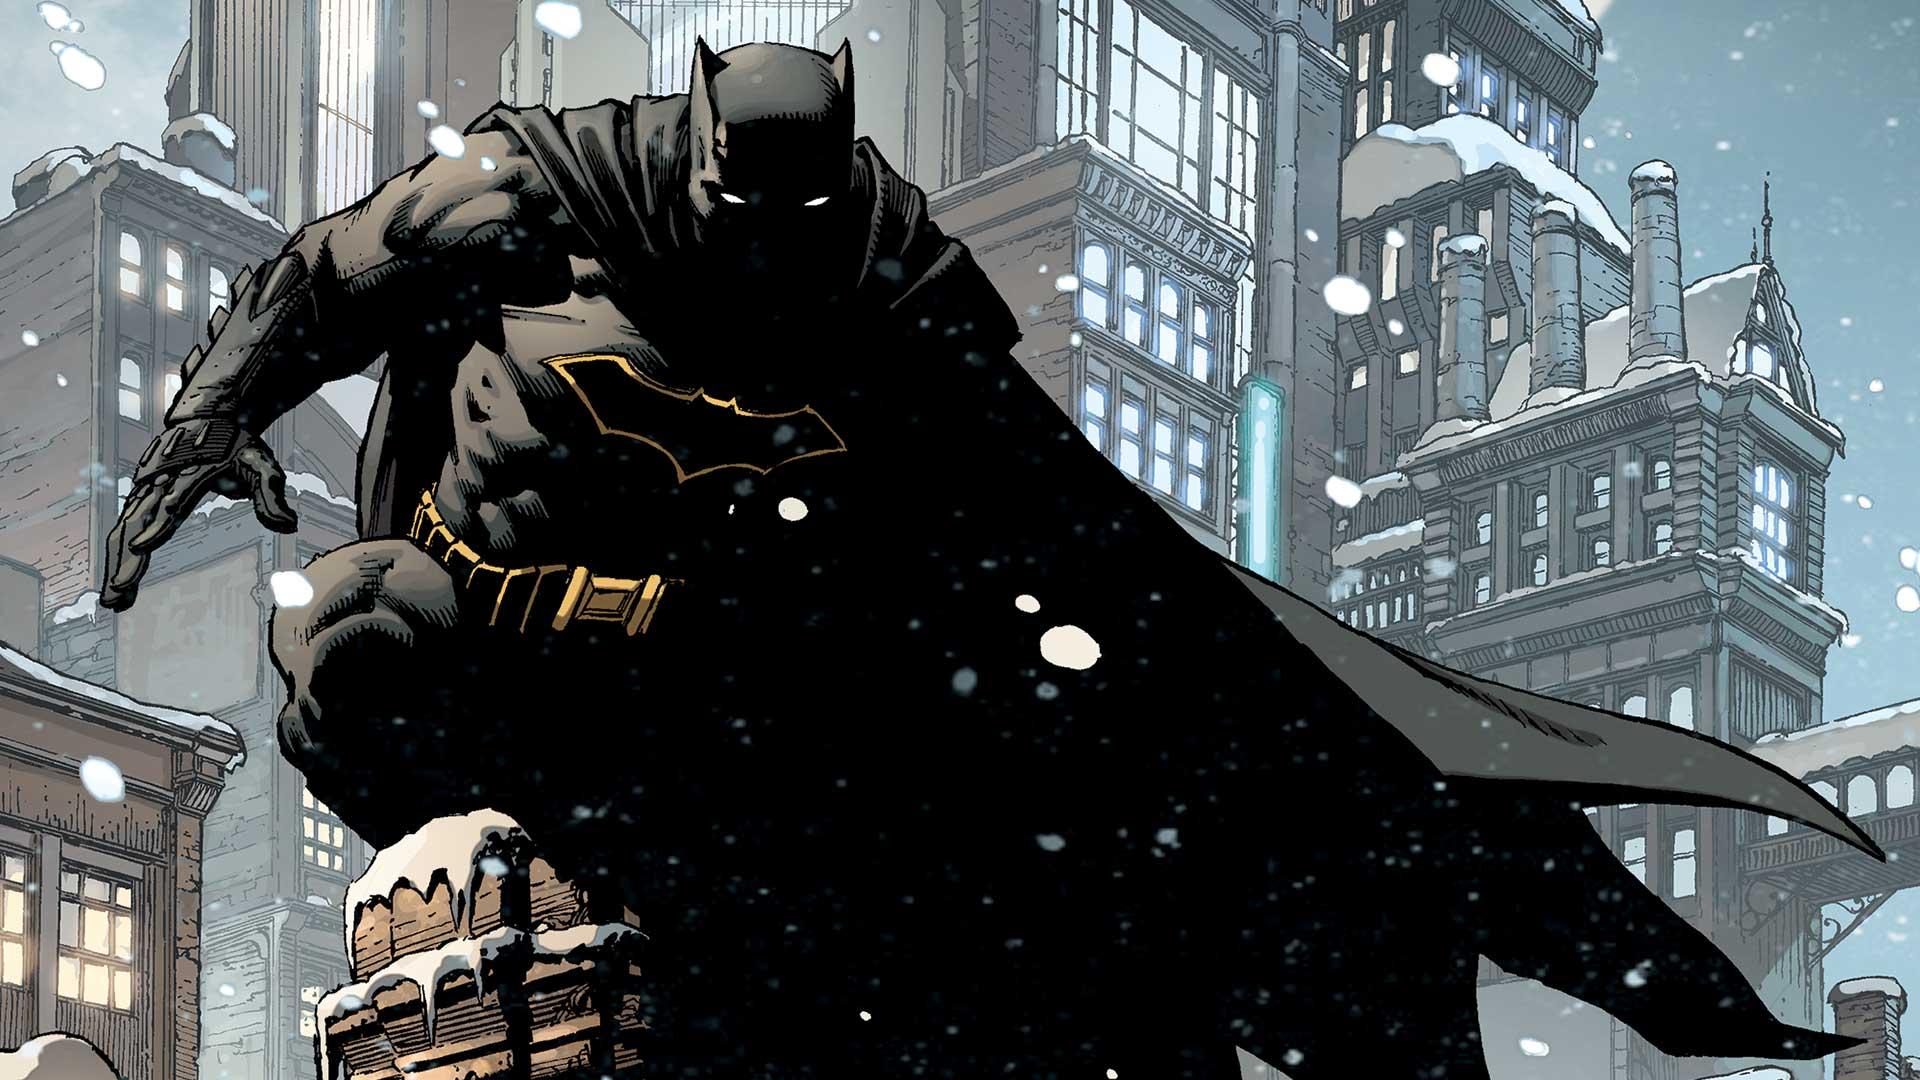 David S. Goyer Returns to the Dark Knight with Batman Unburied